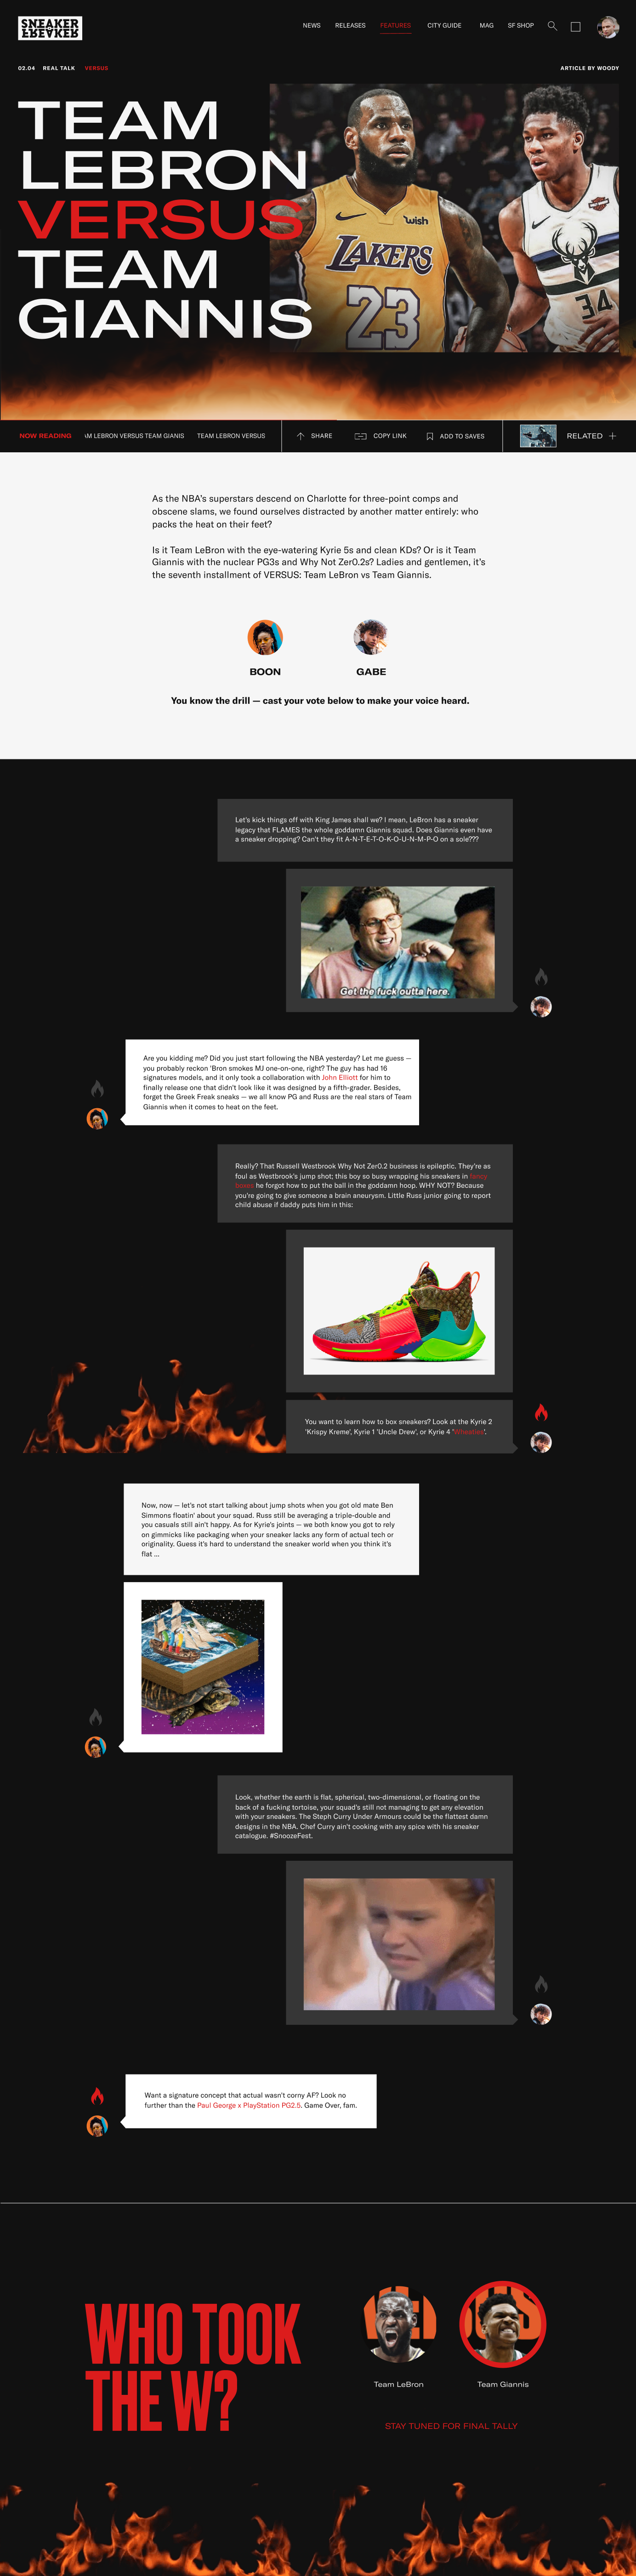 Full screen screen of a Versus article from sneakerfreaker.com